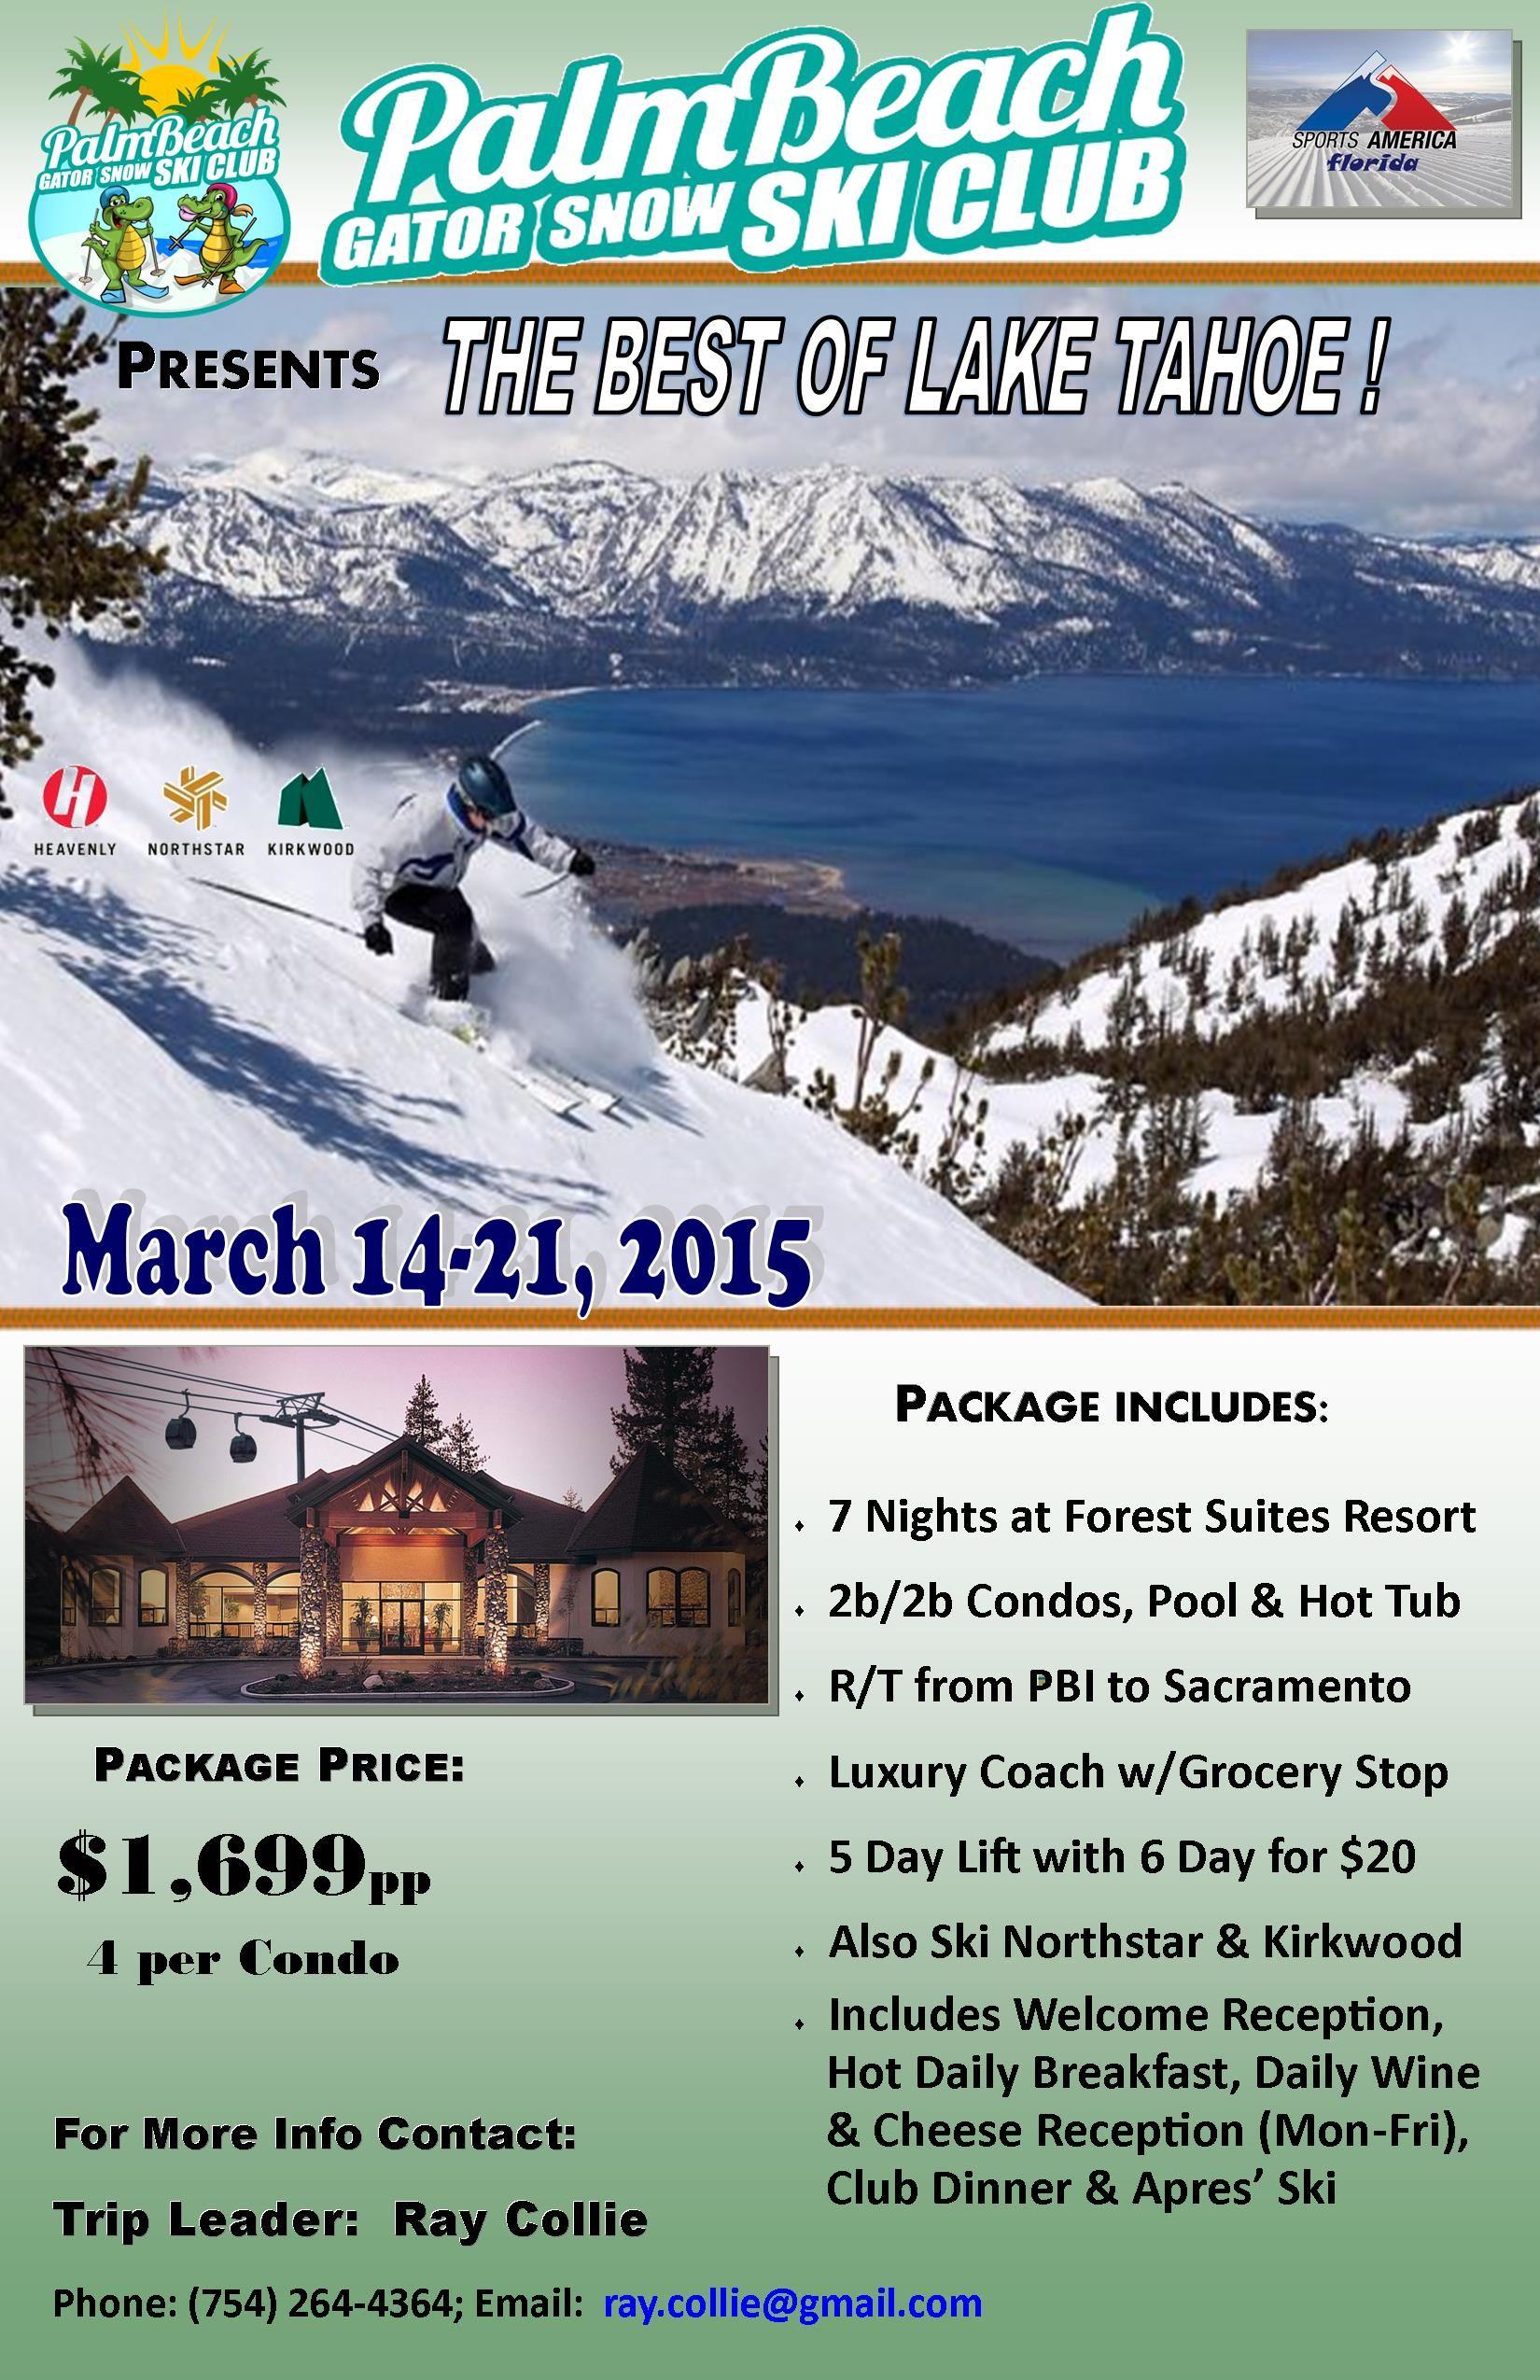 Palm Beach County Spring Break! | Snow Skiing, Palm Beach with Palm Beach County Spring Break 2015